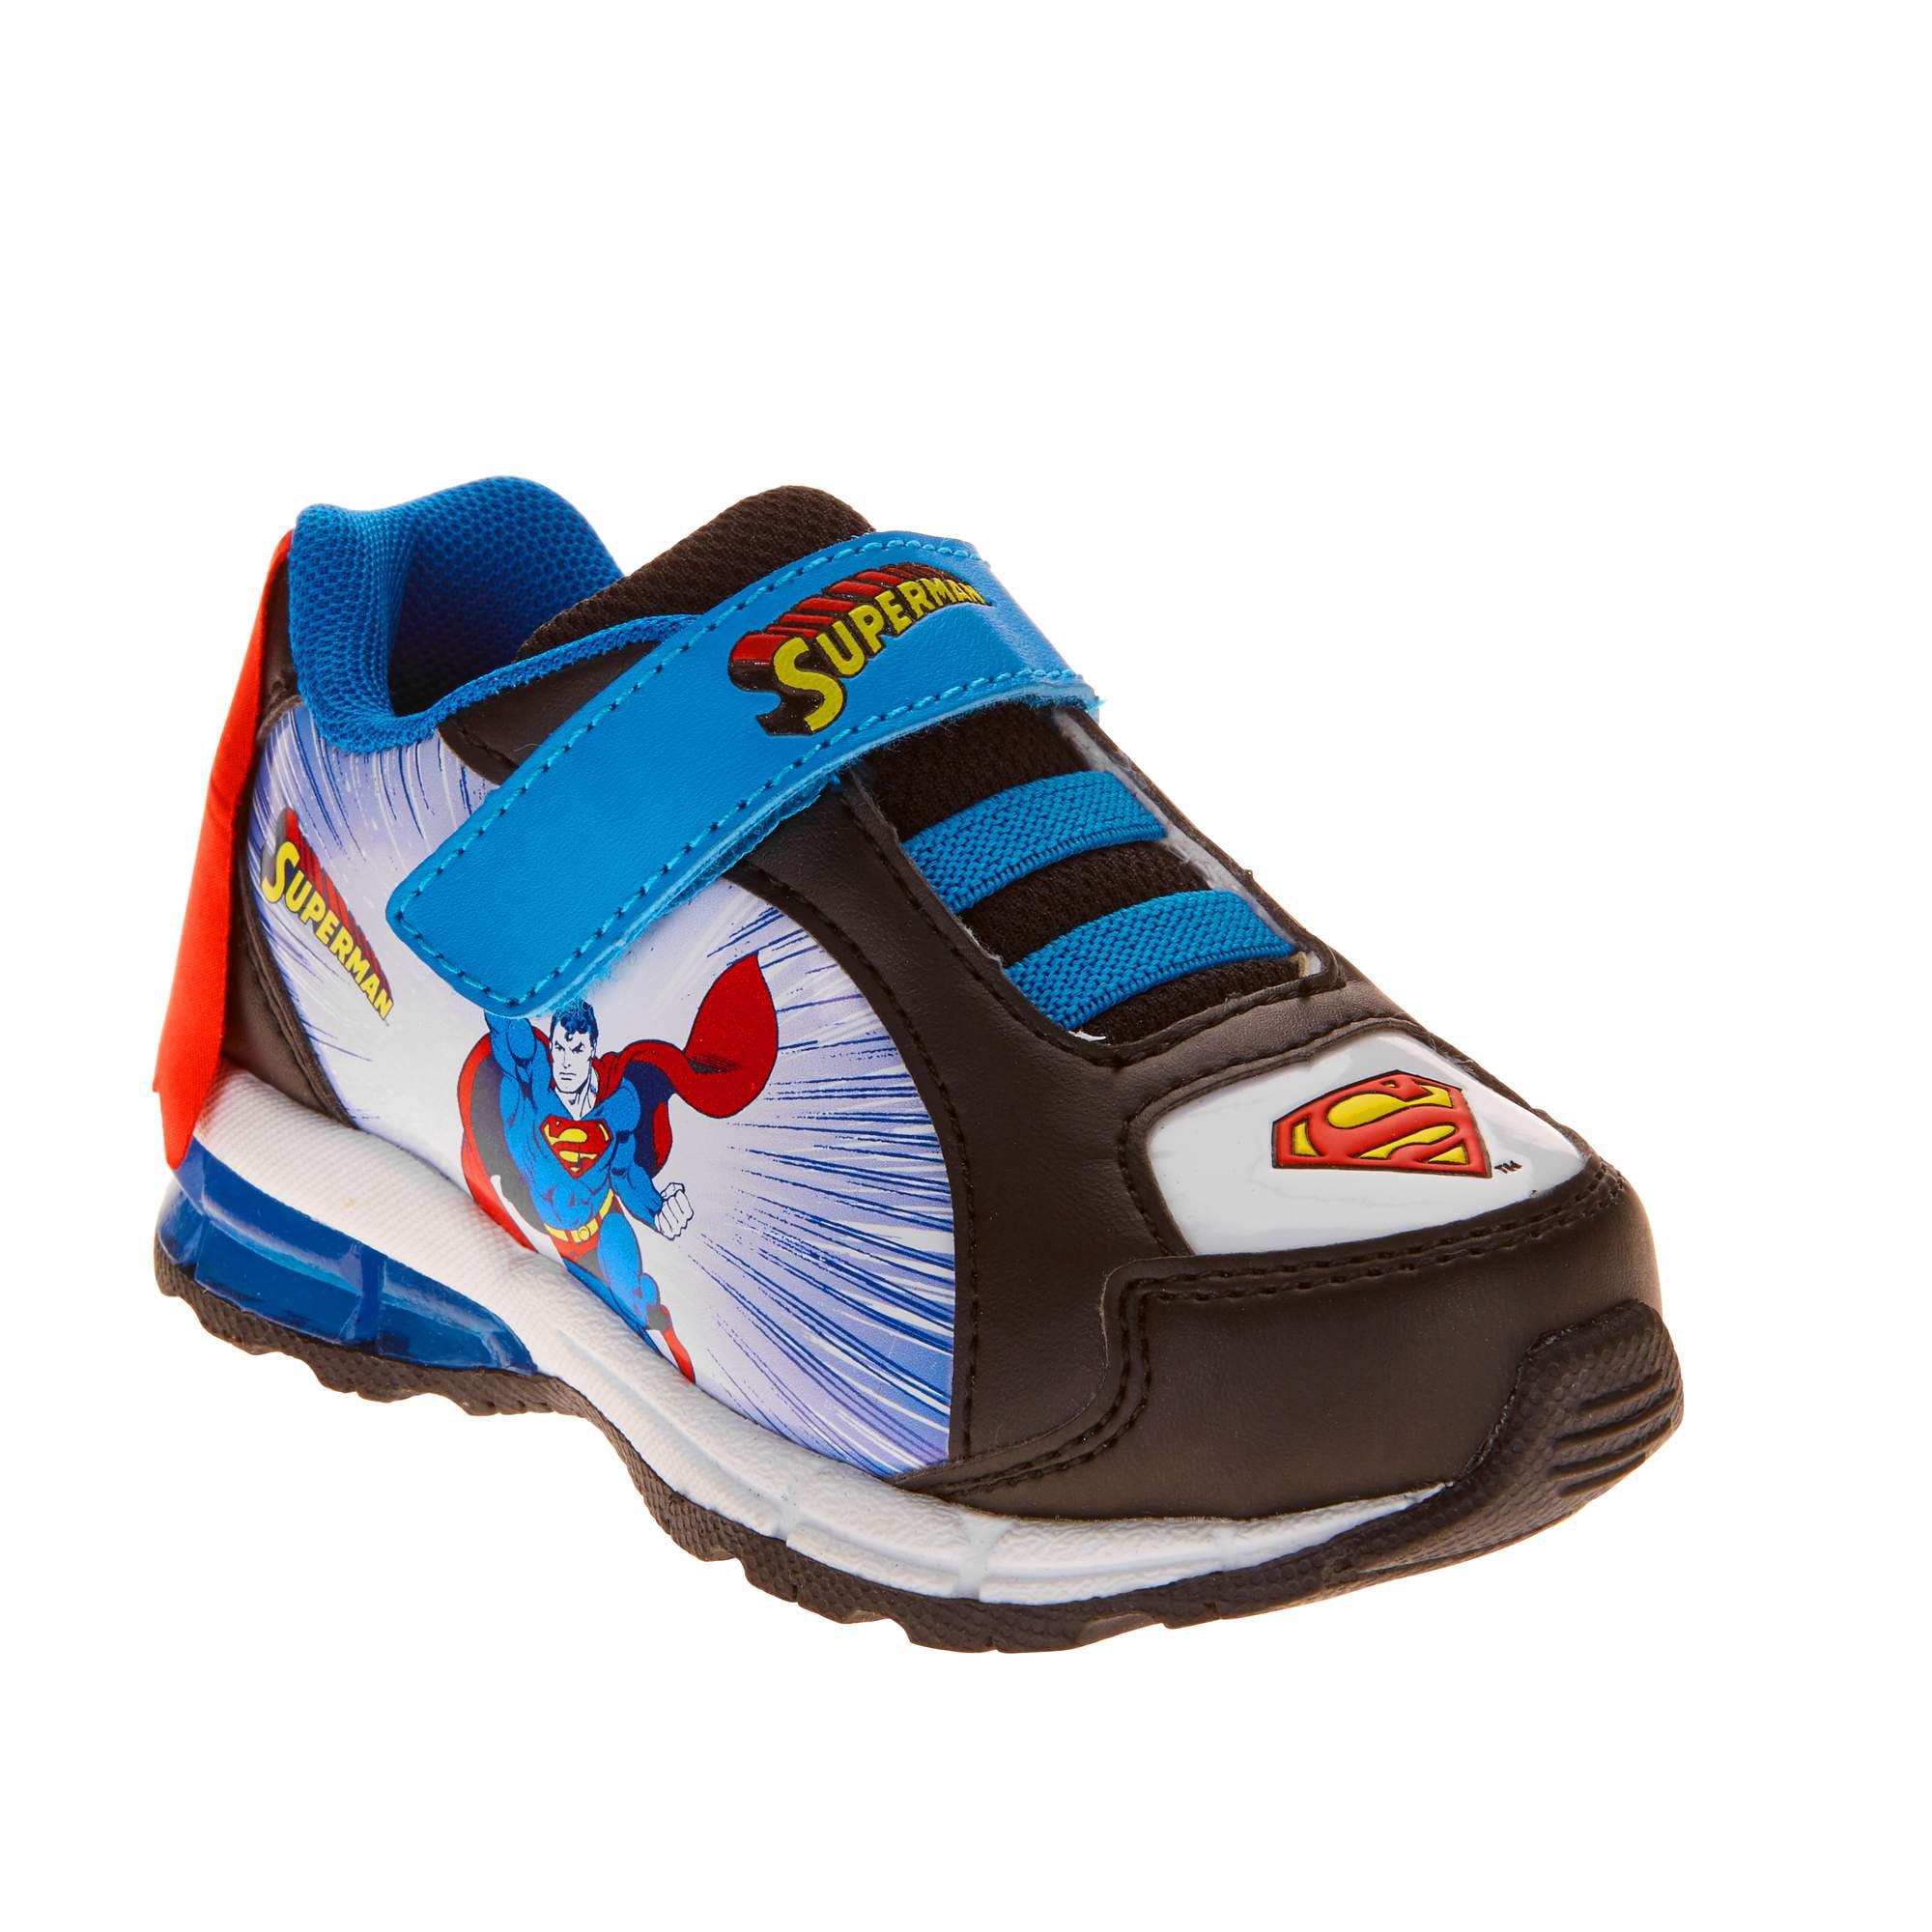 Superman Toddler Boy's Athletic Sneaker